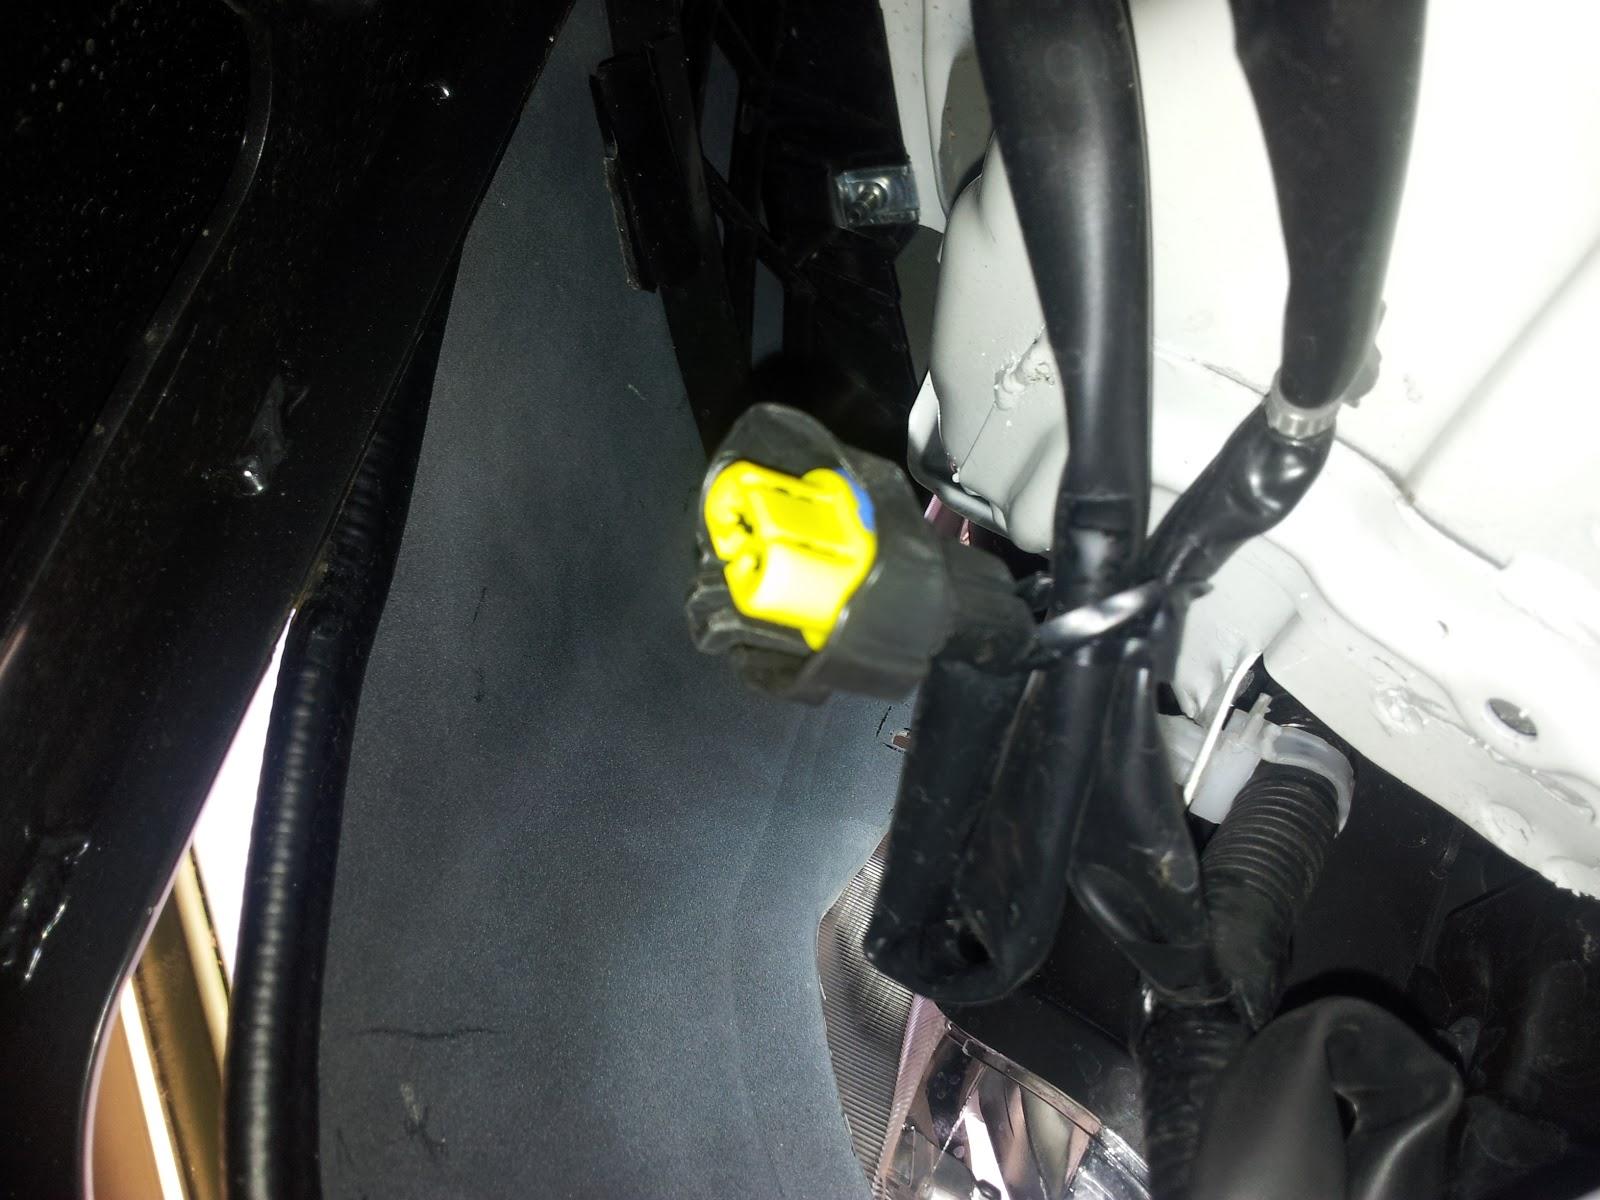 Nissan Navara D40 Headlight Wiring Diagram : Wiring in arb bullbar lights indicators archive the navara forum